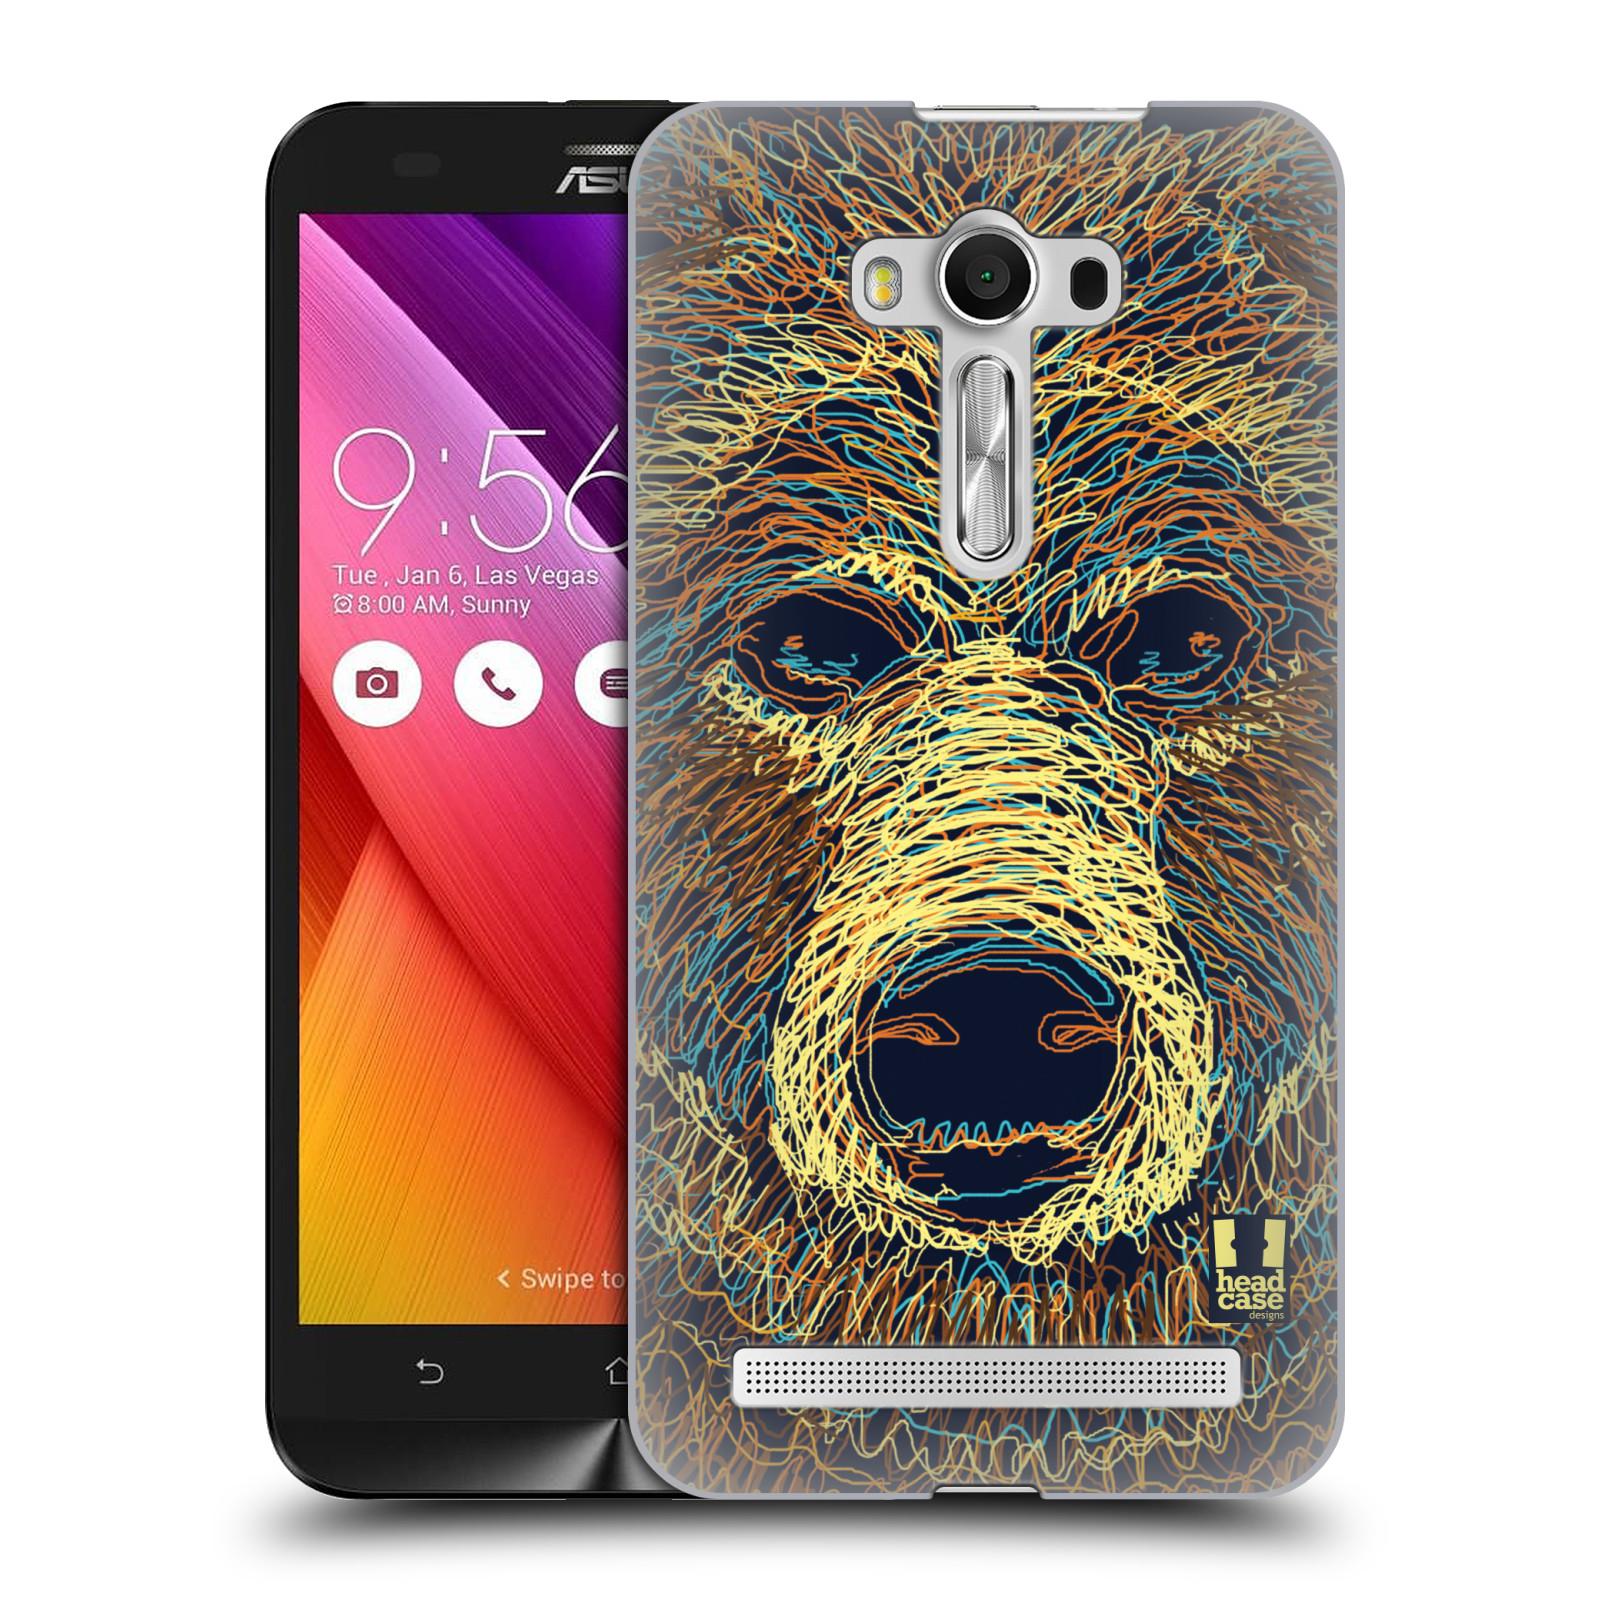 HEAD CASE plastový obal na mobil Asus Zenfone 2 LASER (5,5 displej ZE550KL) vzor zvíře čmáranice medvěd